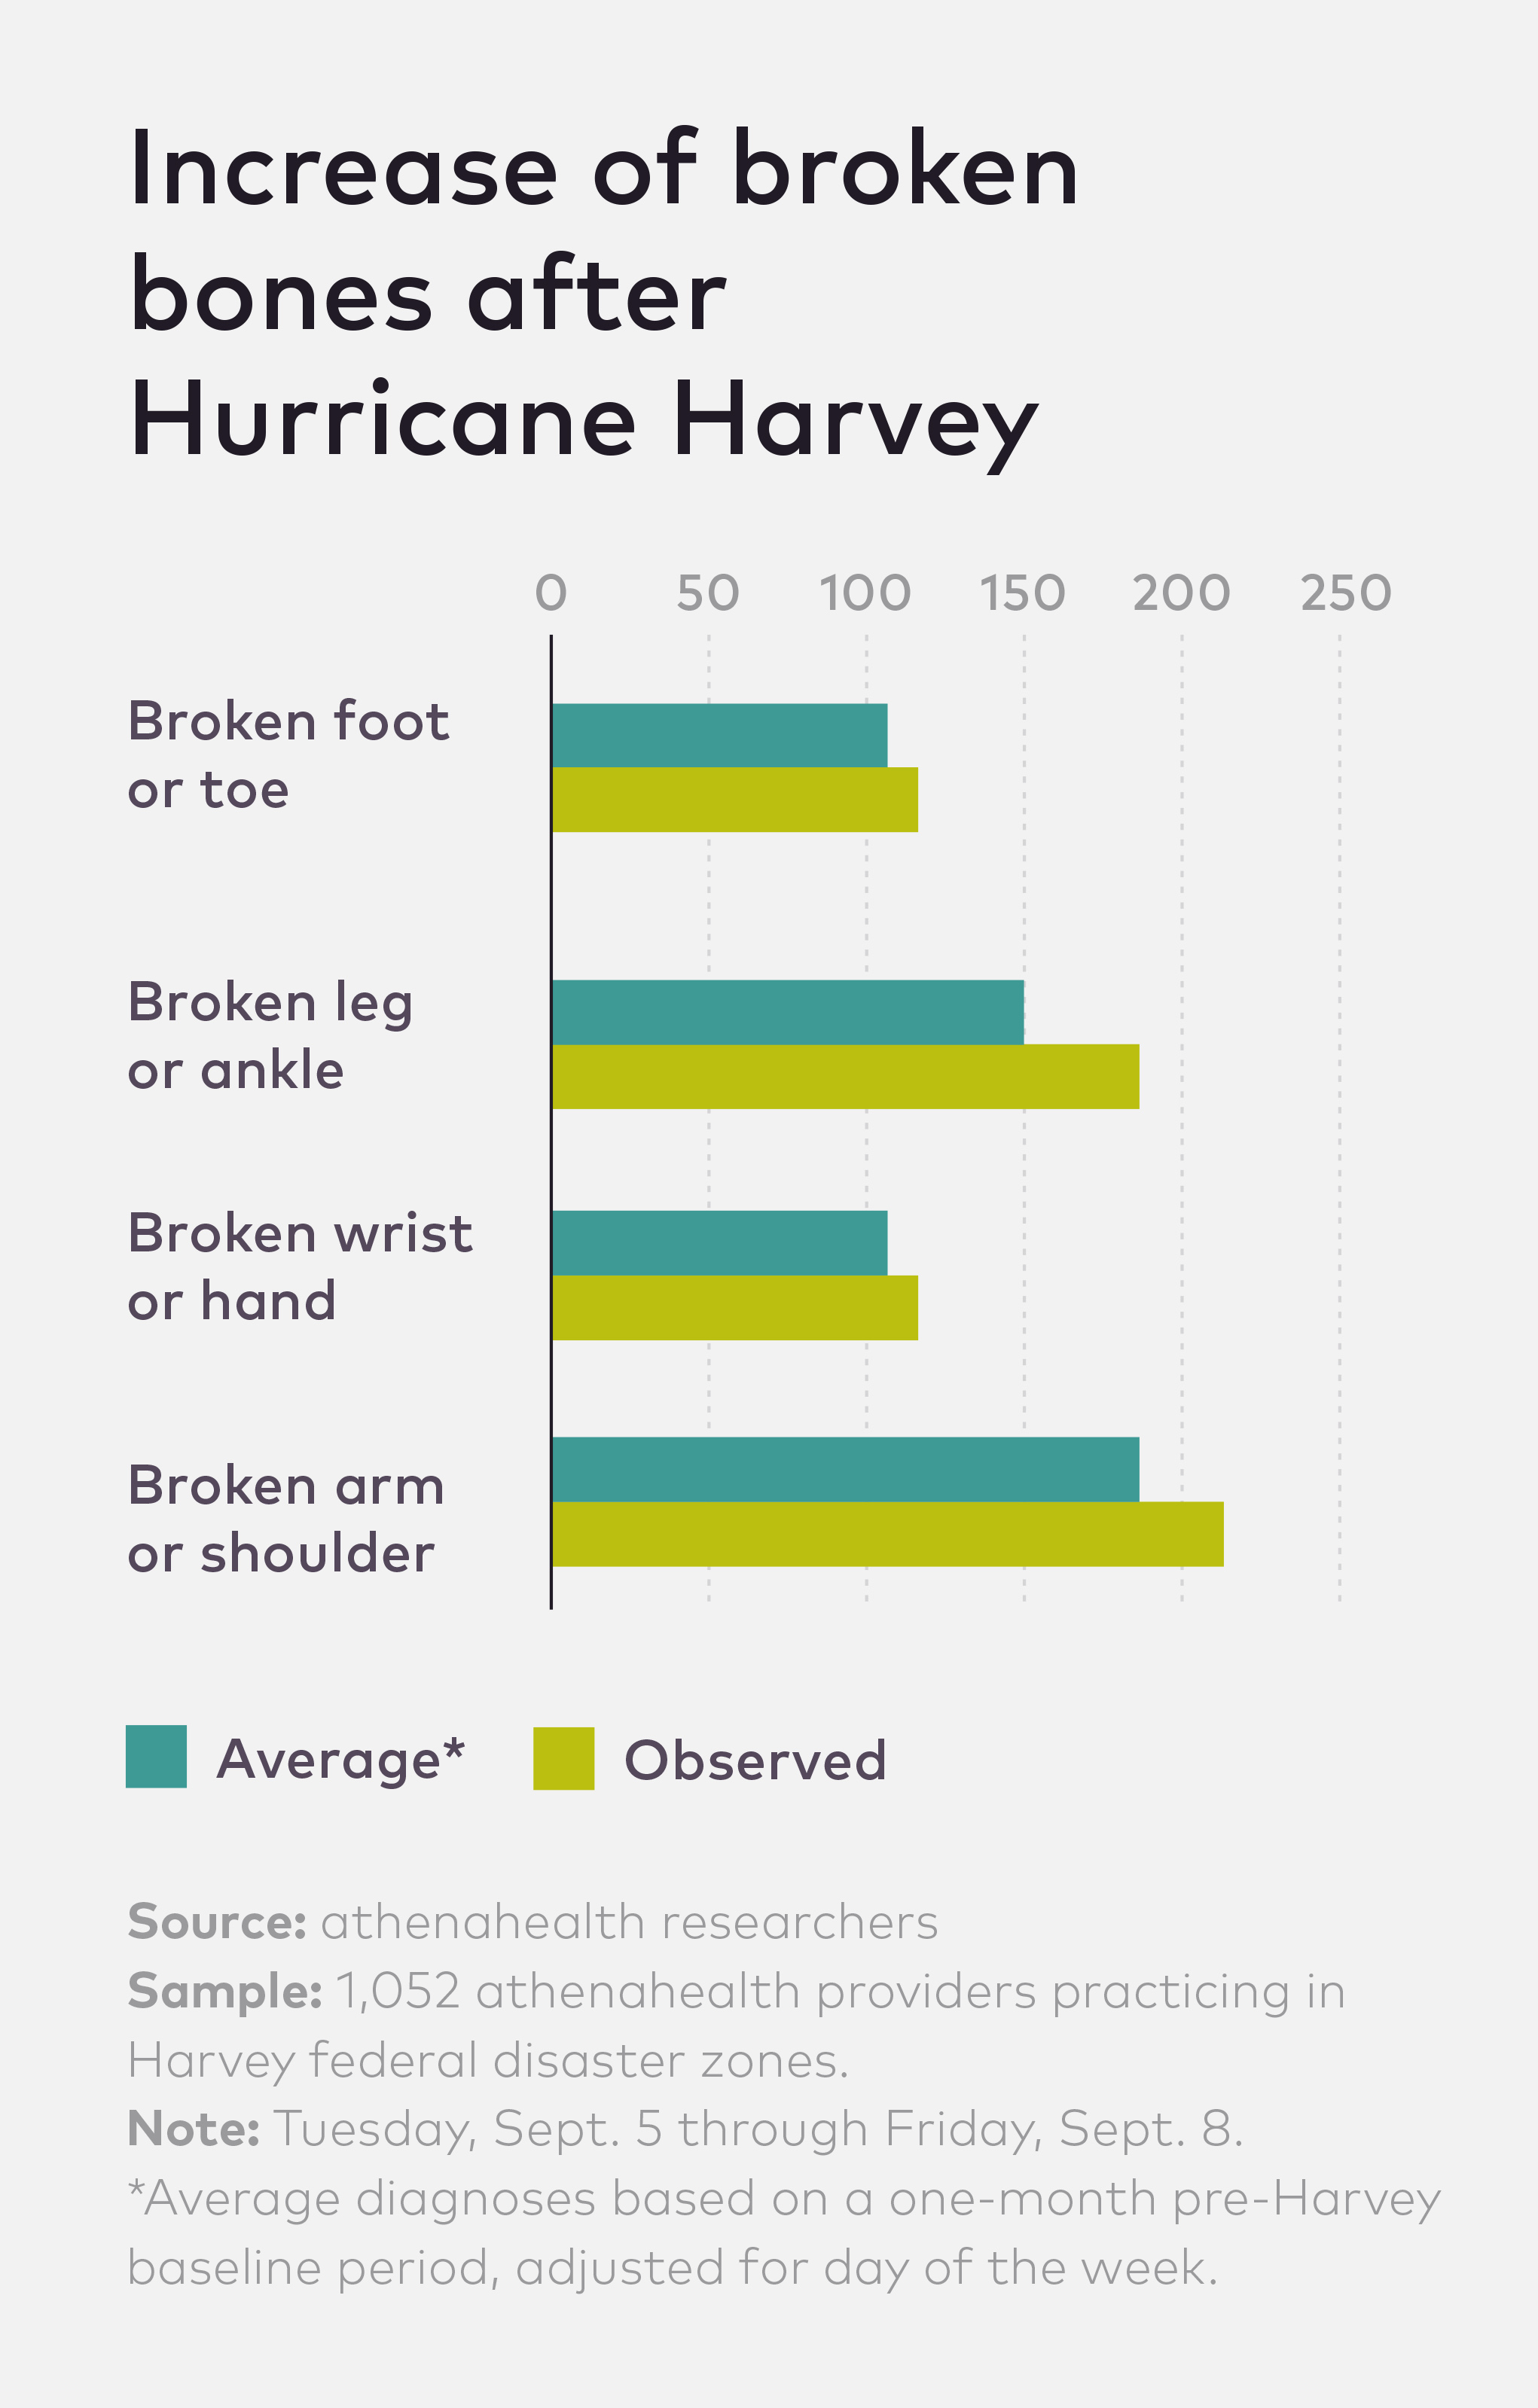 Chart showing risk of broken bone after Hurricane Harvey.